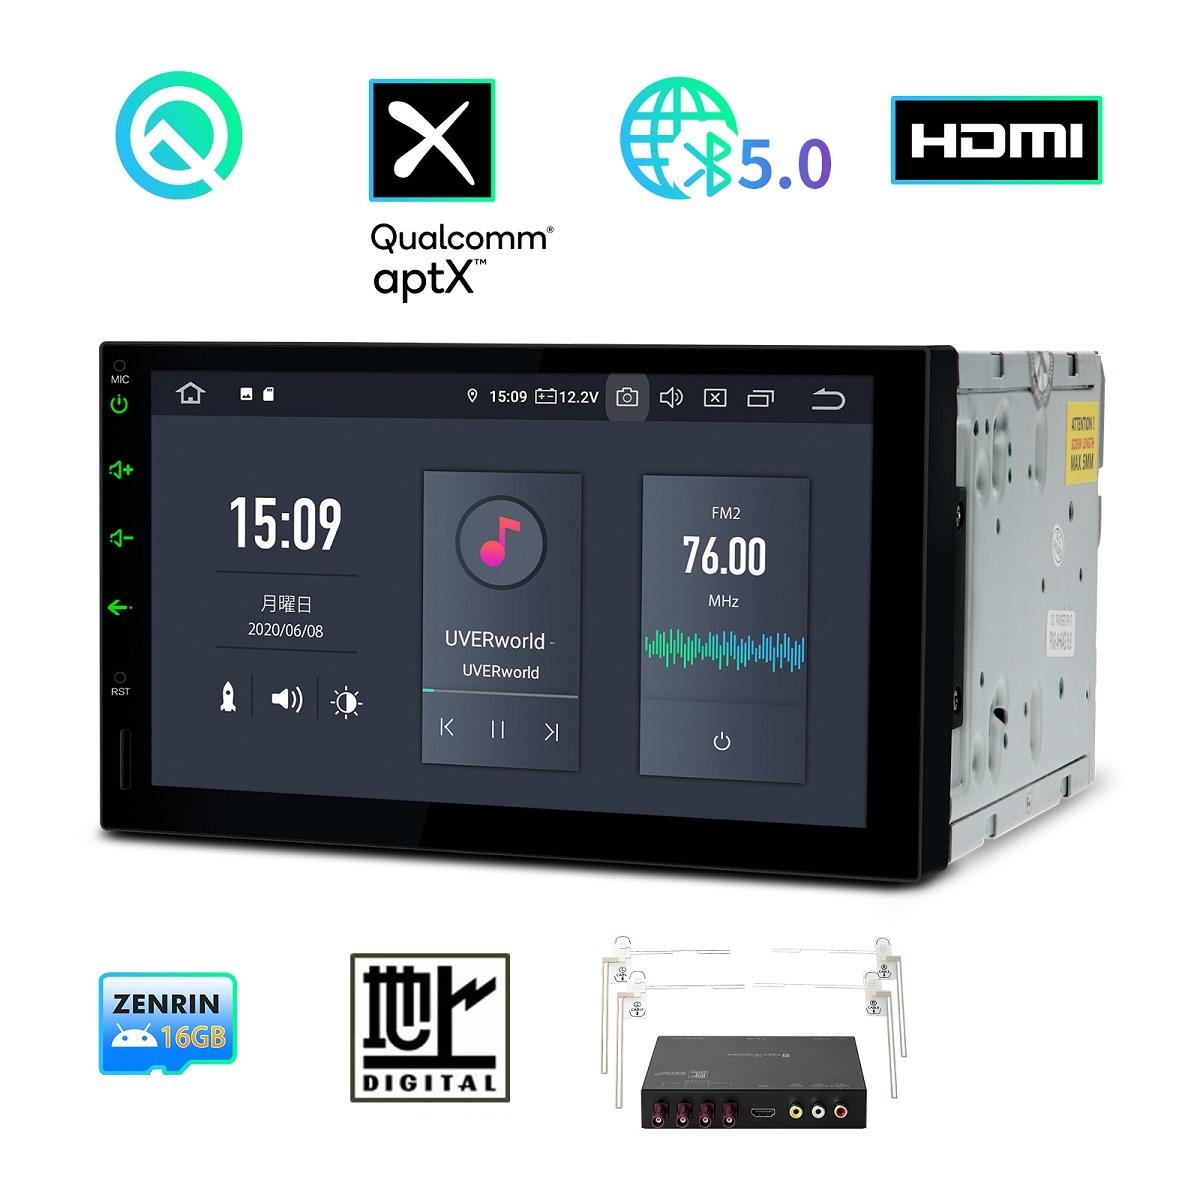 (TQ700SIL) XTRONS Android10.0 6コア 2DIN 7インチ 車載PC フルセグ 地デジ搭載 アプリ連動操作可 最新16GB地図付 HDMI出力 RAM4G ROM64G カーステレオ カーオーディオ OBD2 ミラーリング 4K DVR aptX